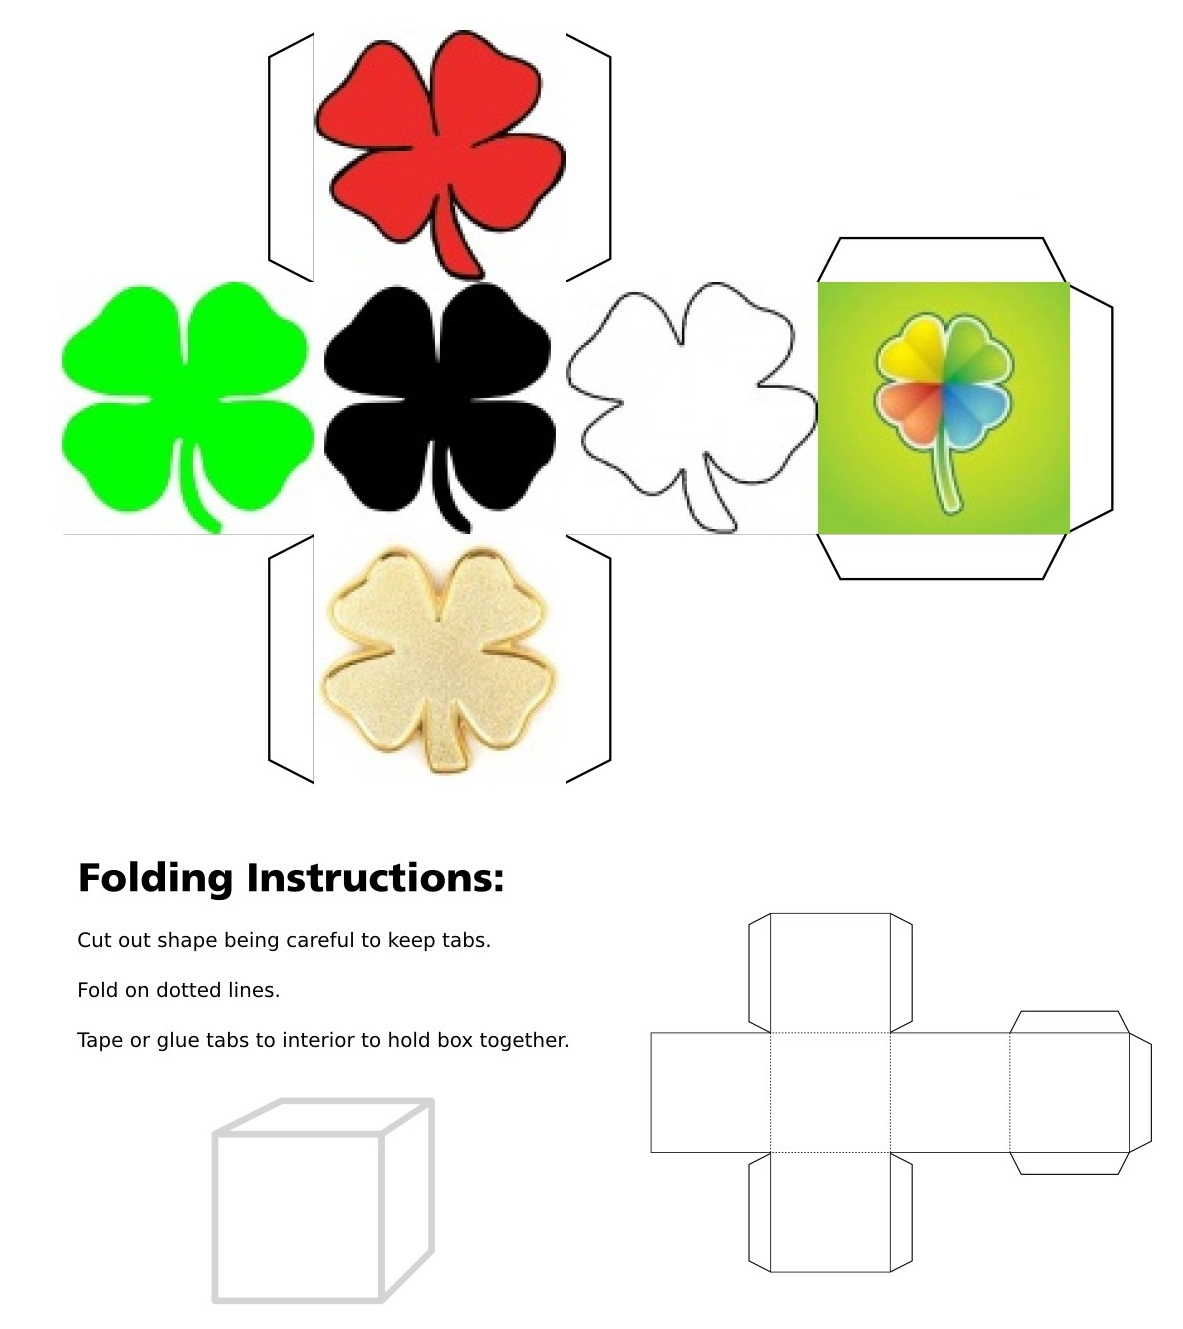 3D cube, dice, Good Luck, Good Luck Dice, Green Clover, Red Clover, Black Clover, Gold Clover, White Clover, Rainbow Clover, Four Leaf Clover